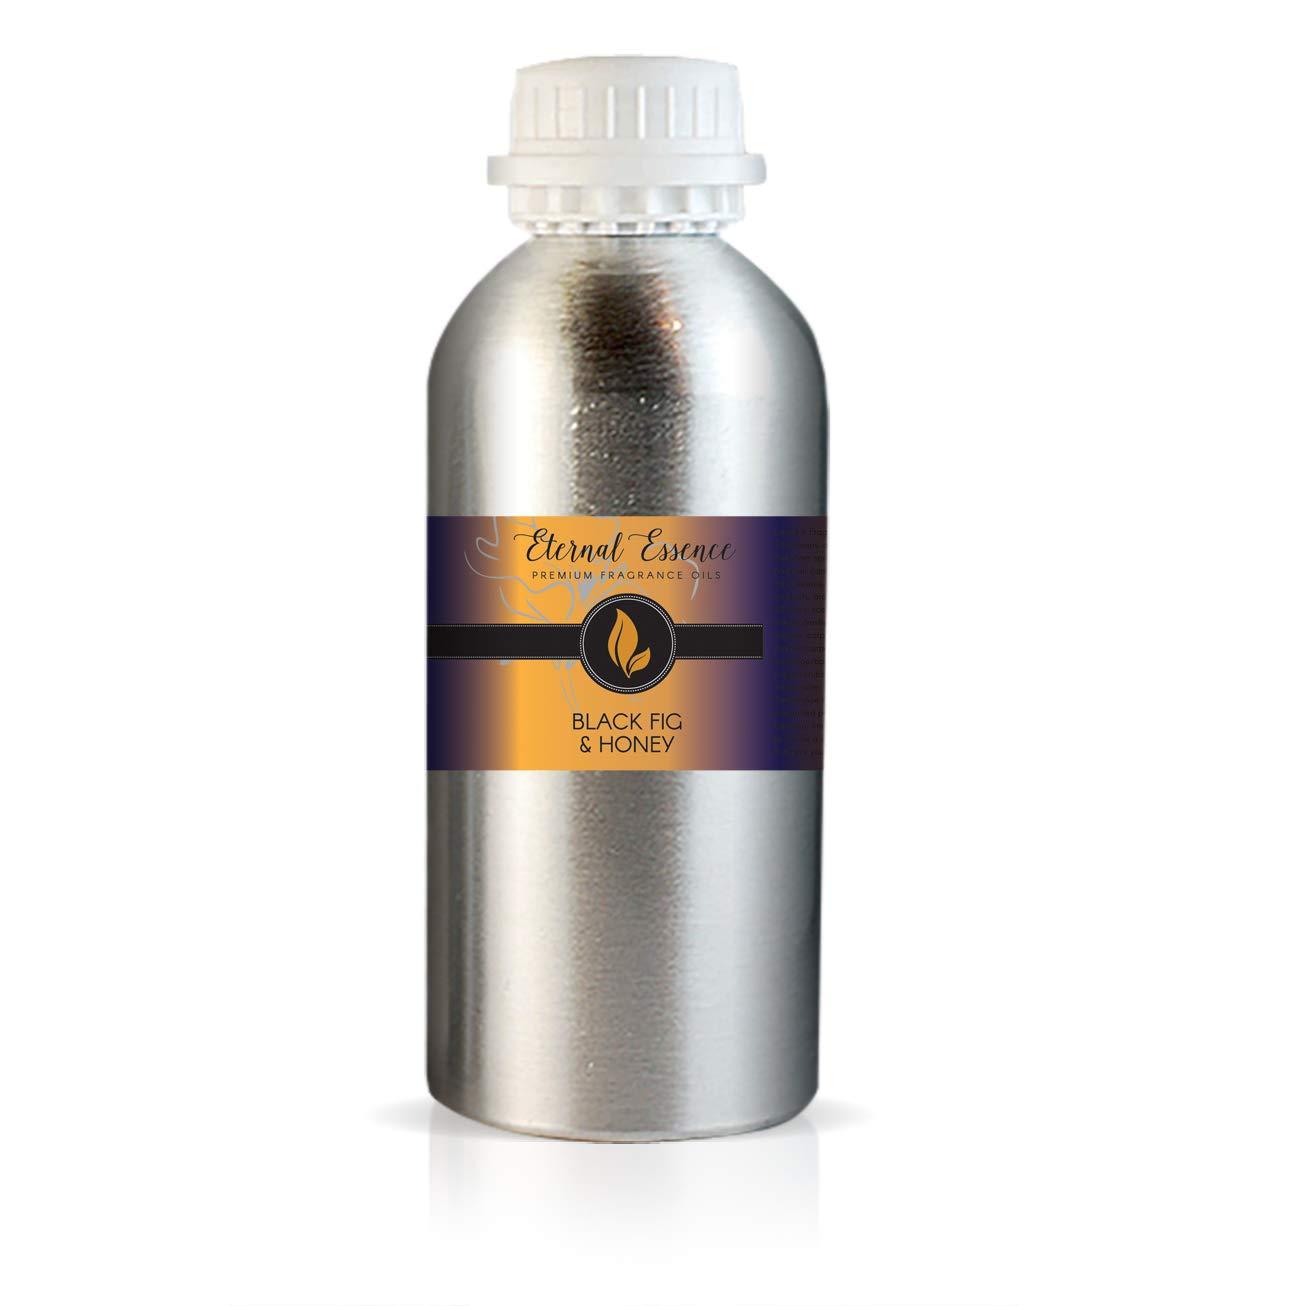 Black Fig Honey Award-winning store Recommendation - Premium Grade Oil Scented Fragrance